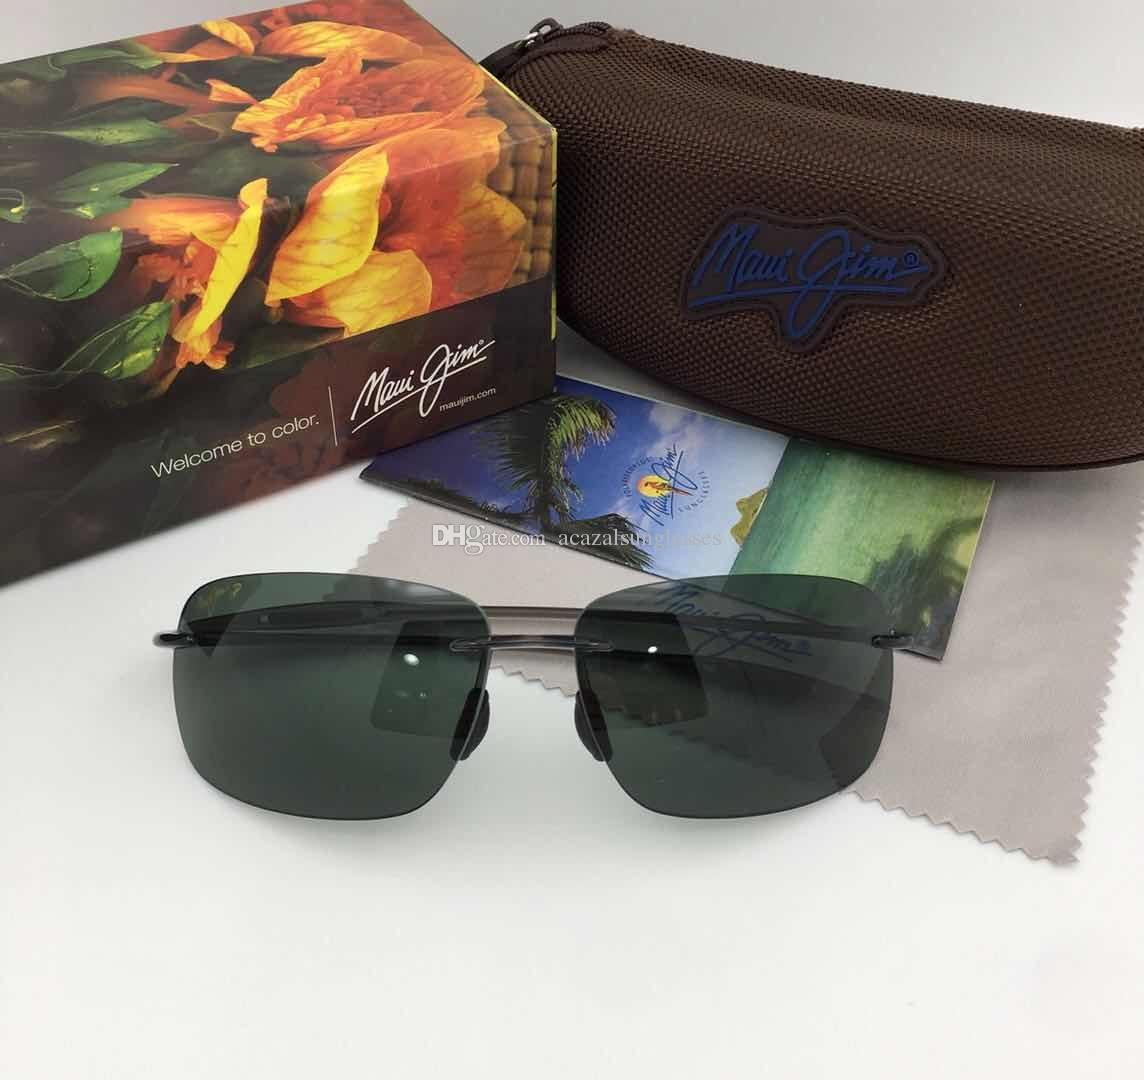 a27d51c2d180 2018 FASHION MAUI JIM MJ422 Polarized Men Sports Sunglasses MJ422 Women  Sunglasses CLEAR-GRAY FRAME LIGHT-GREEN LENS WITH BOX 63mm-13mm-140 SUNGLASSES  MAUI ...